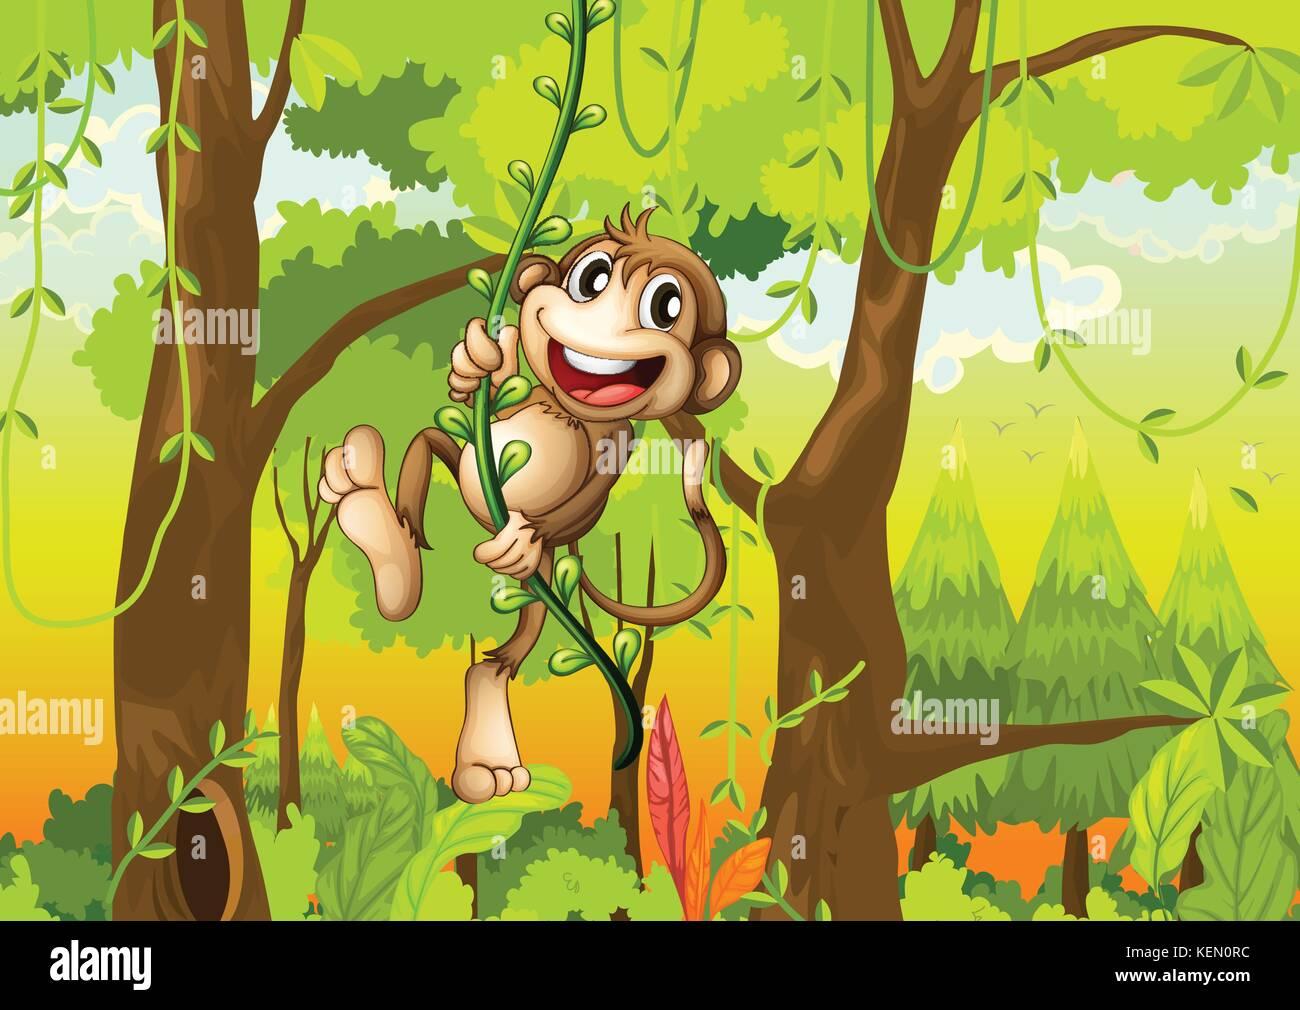 Monkey Swinging Through The Forest Stock Vector Art